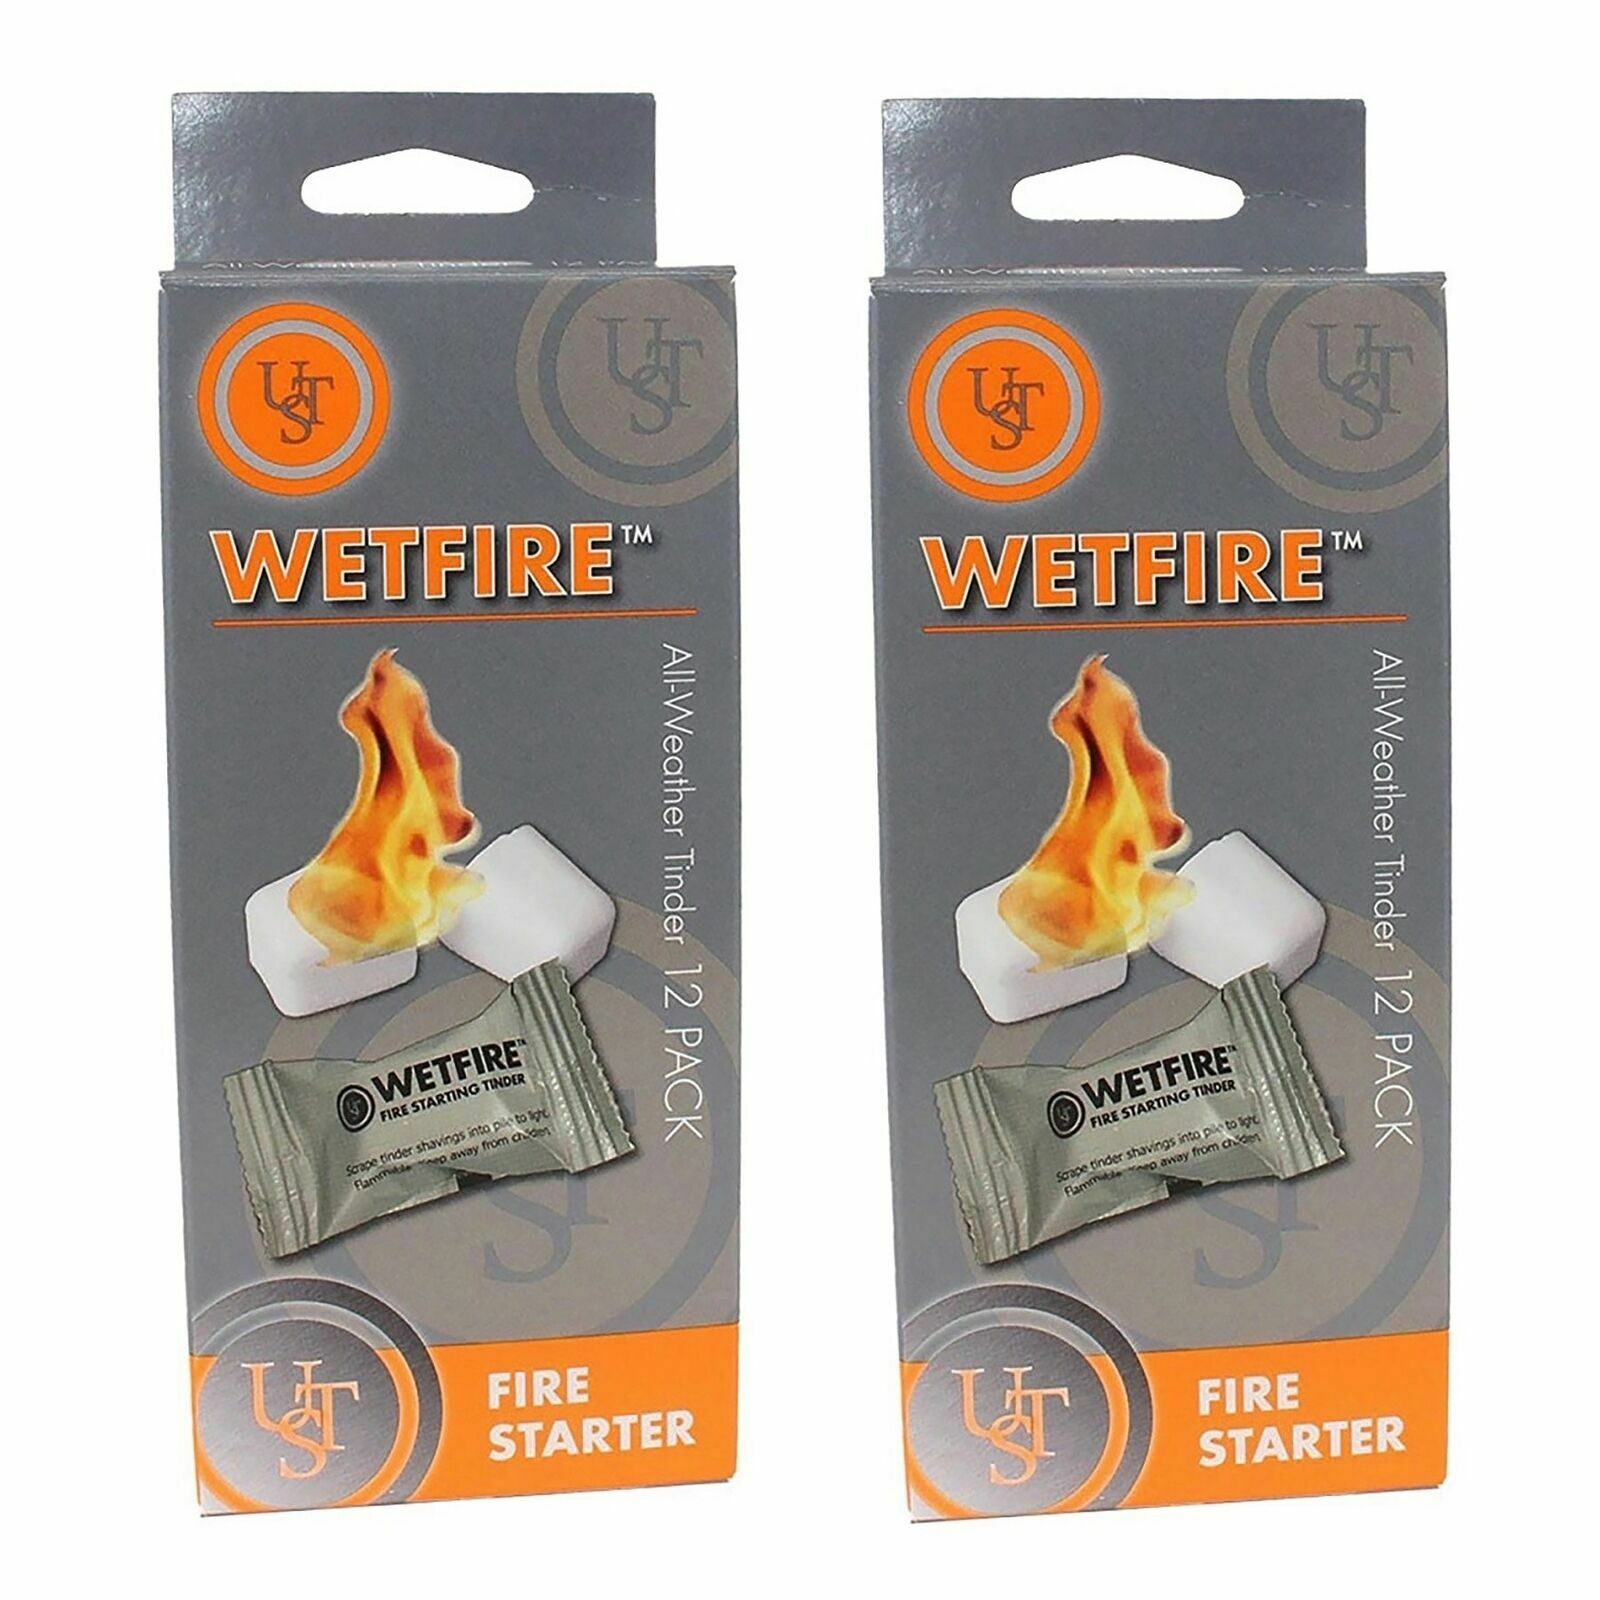 UST WetFire Tinder, 12-Pack